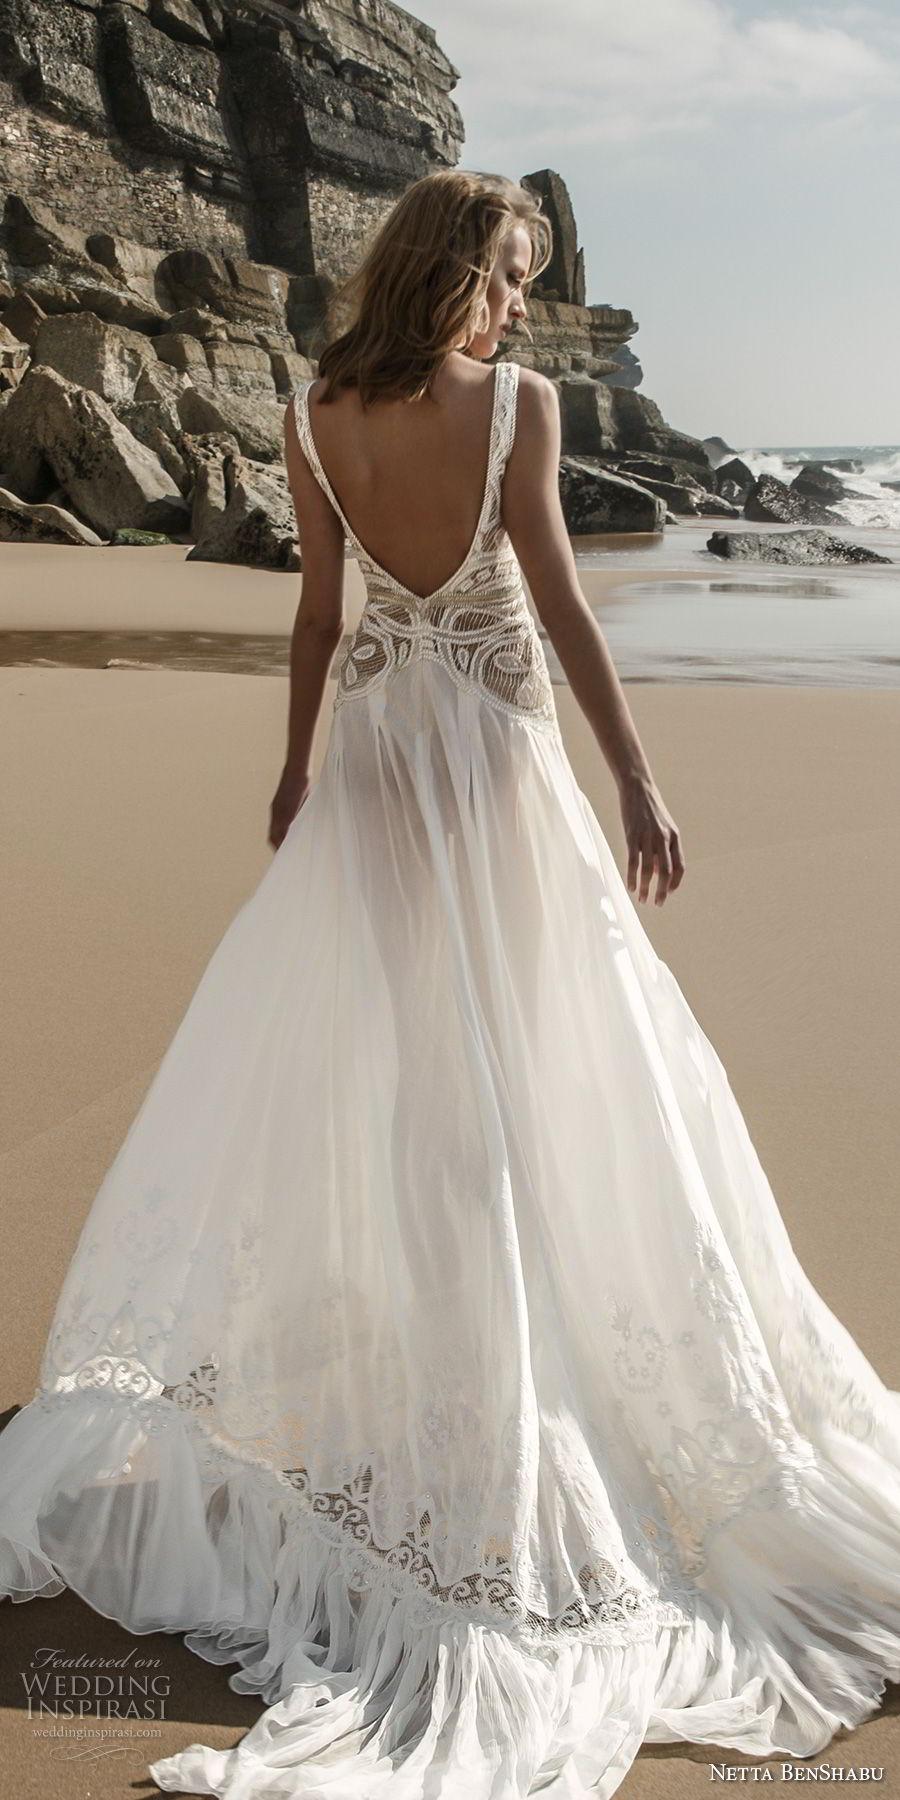 netta benshabu 2017 bridal sleeveless deep v neck heavily embellished bodice high slit skirt sexy romantic soft a  line wedding dress open scoop back chapel train (6) bv